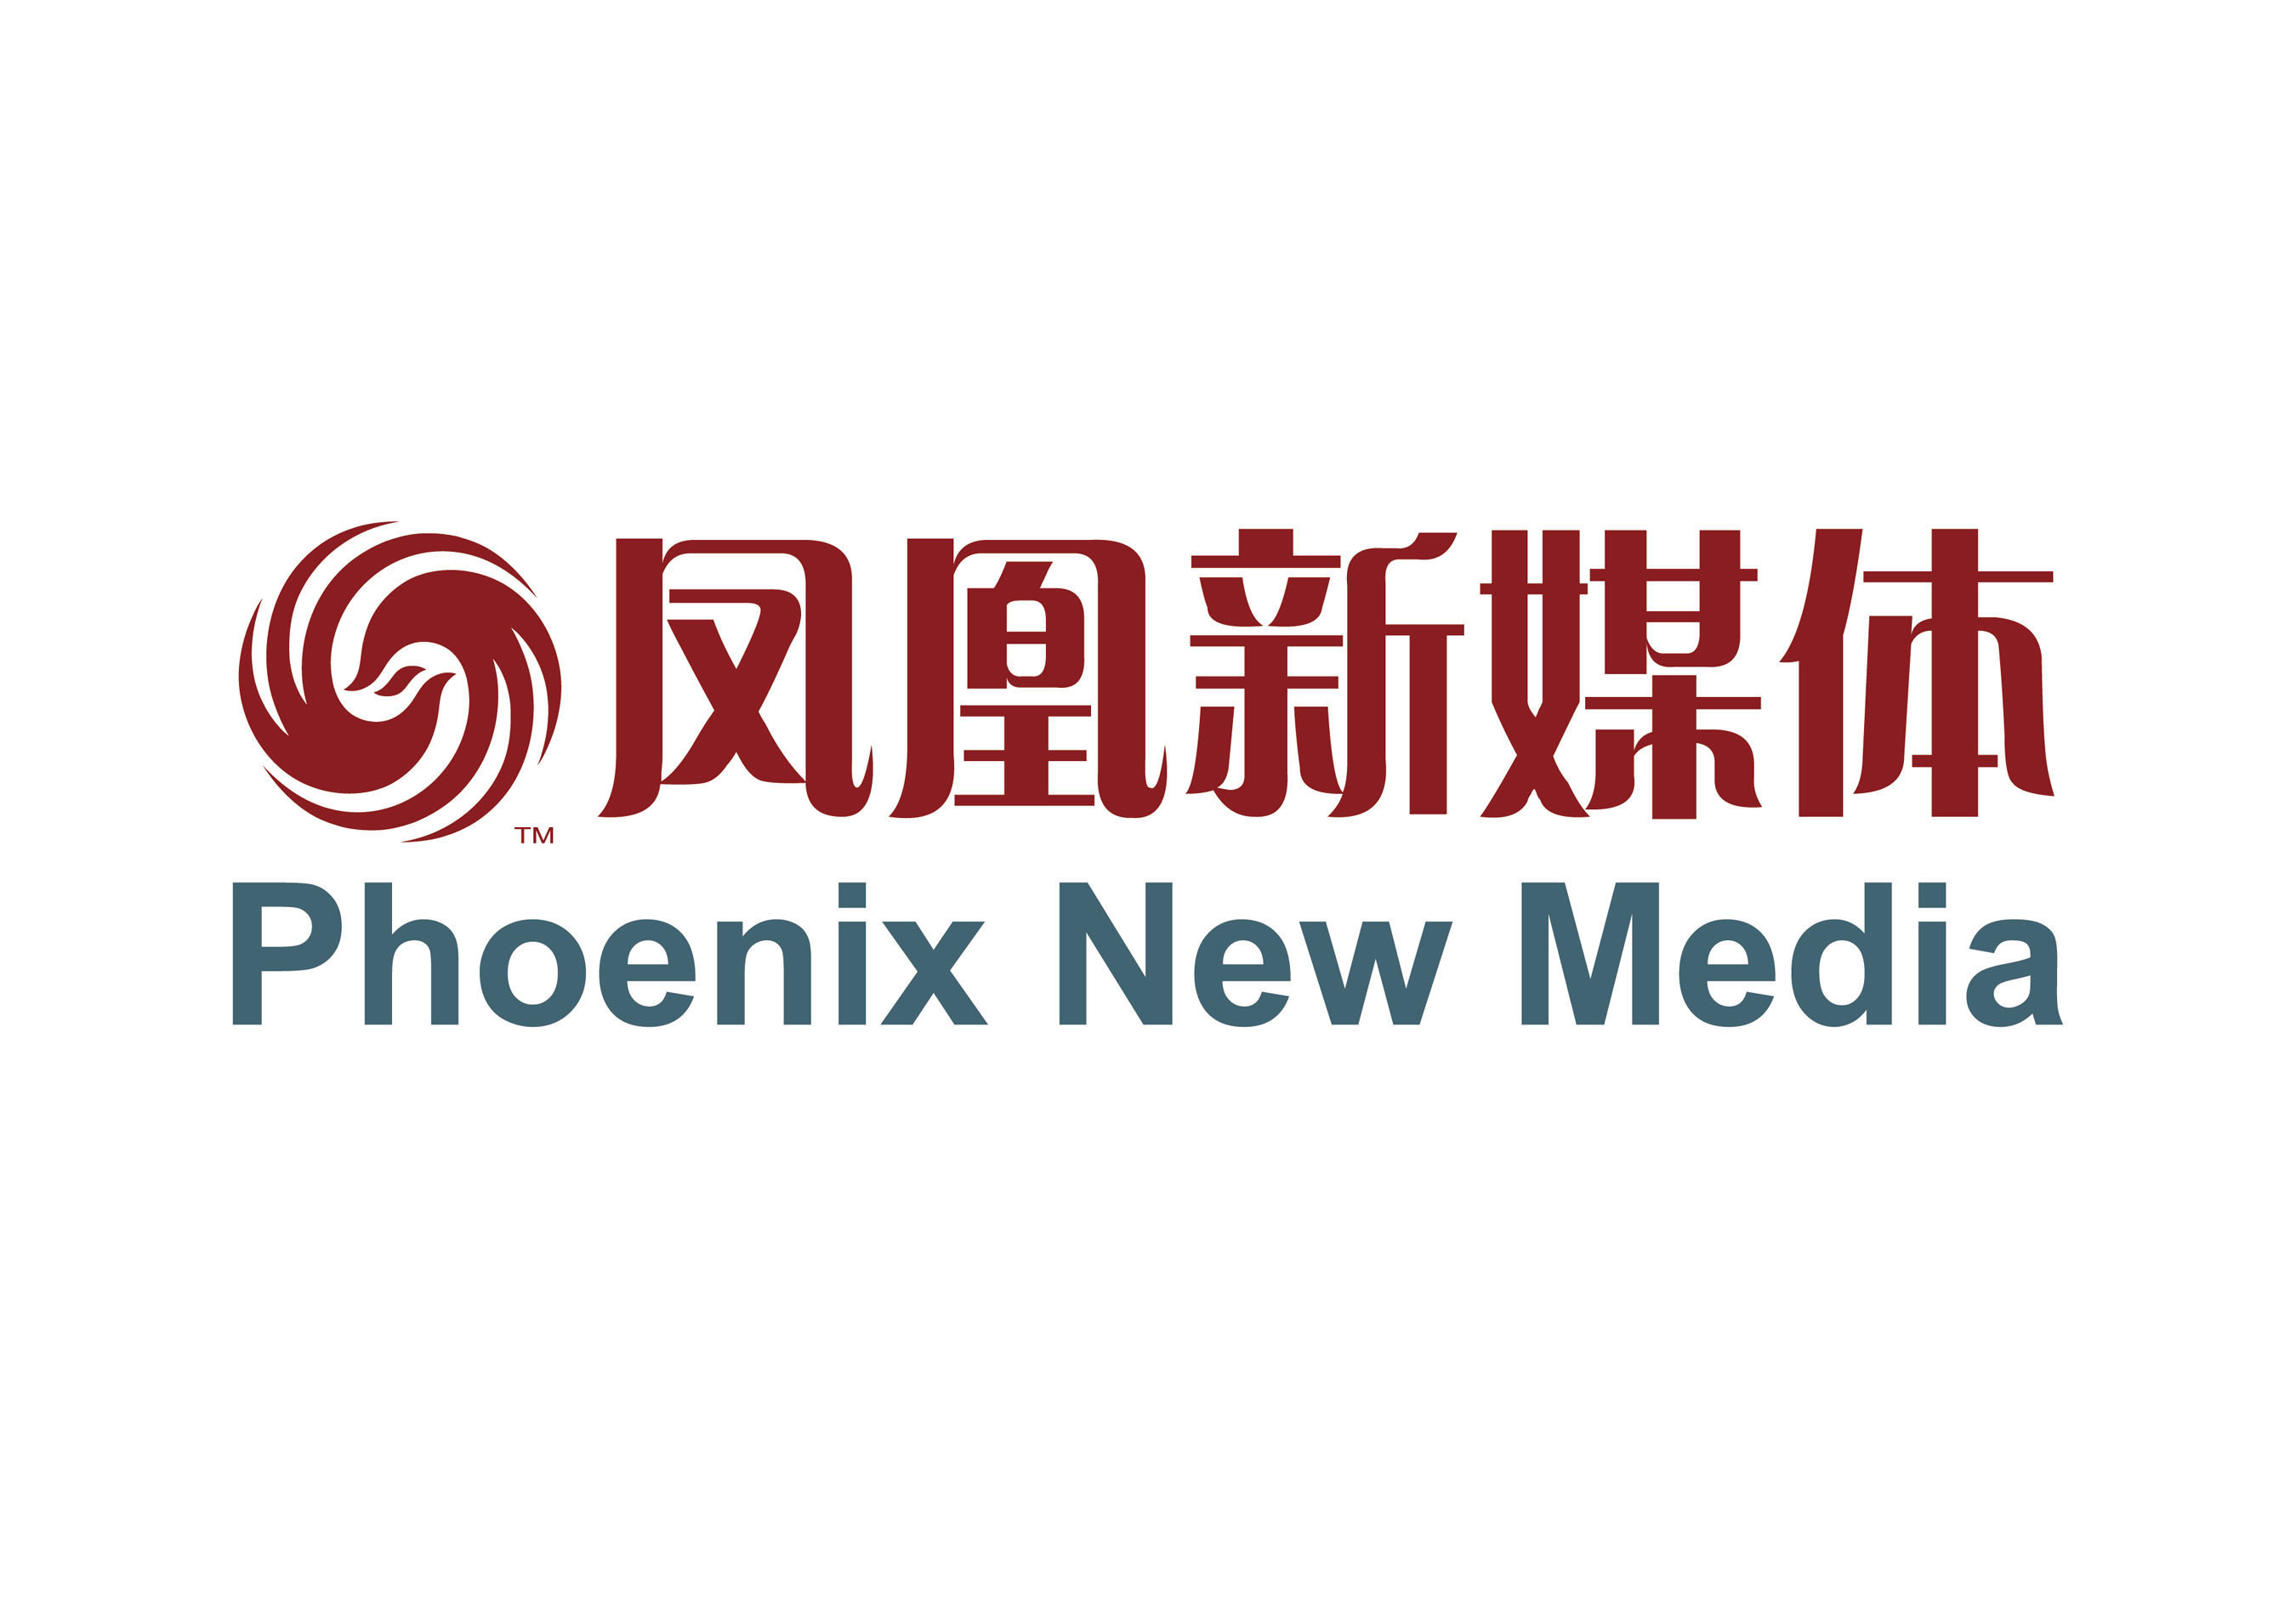 Phoenix New Media Limited Logo